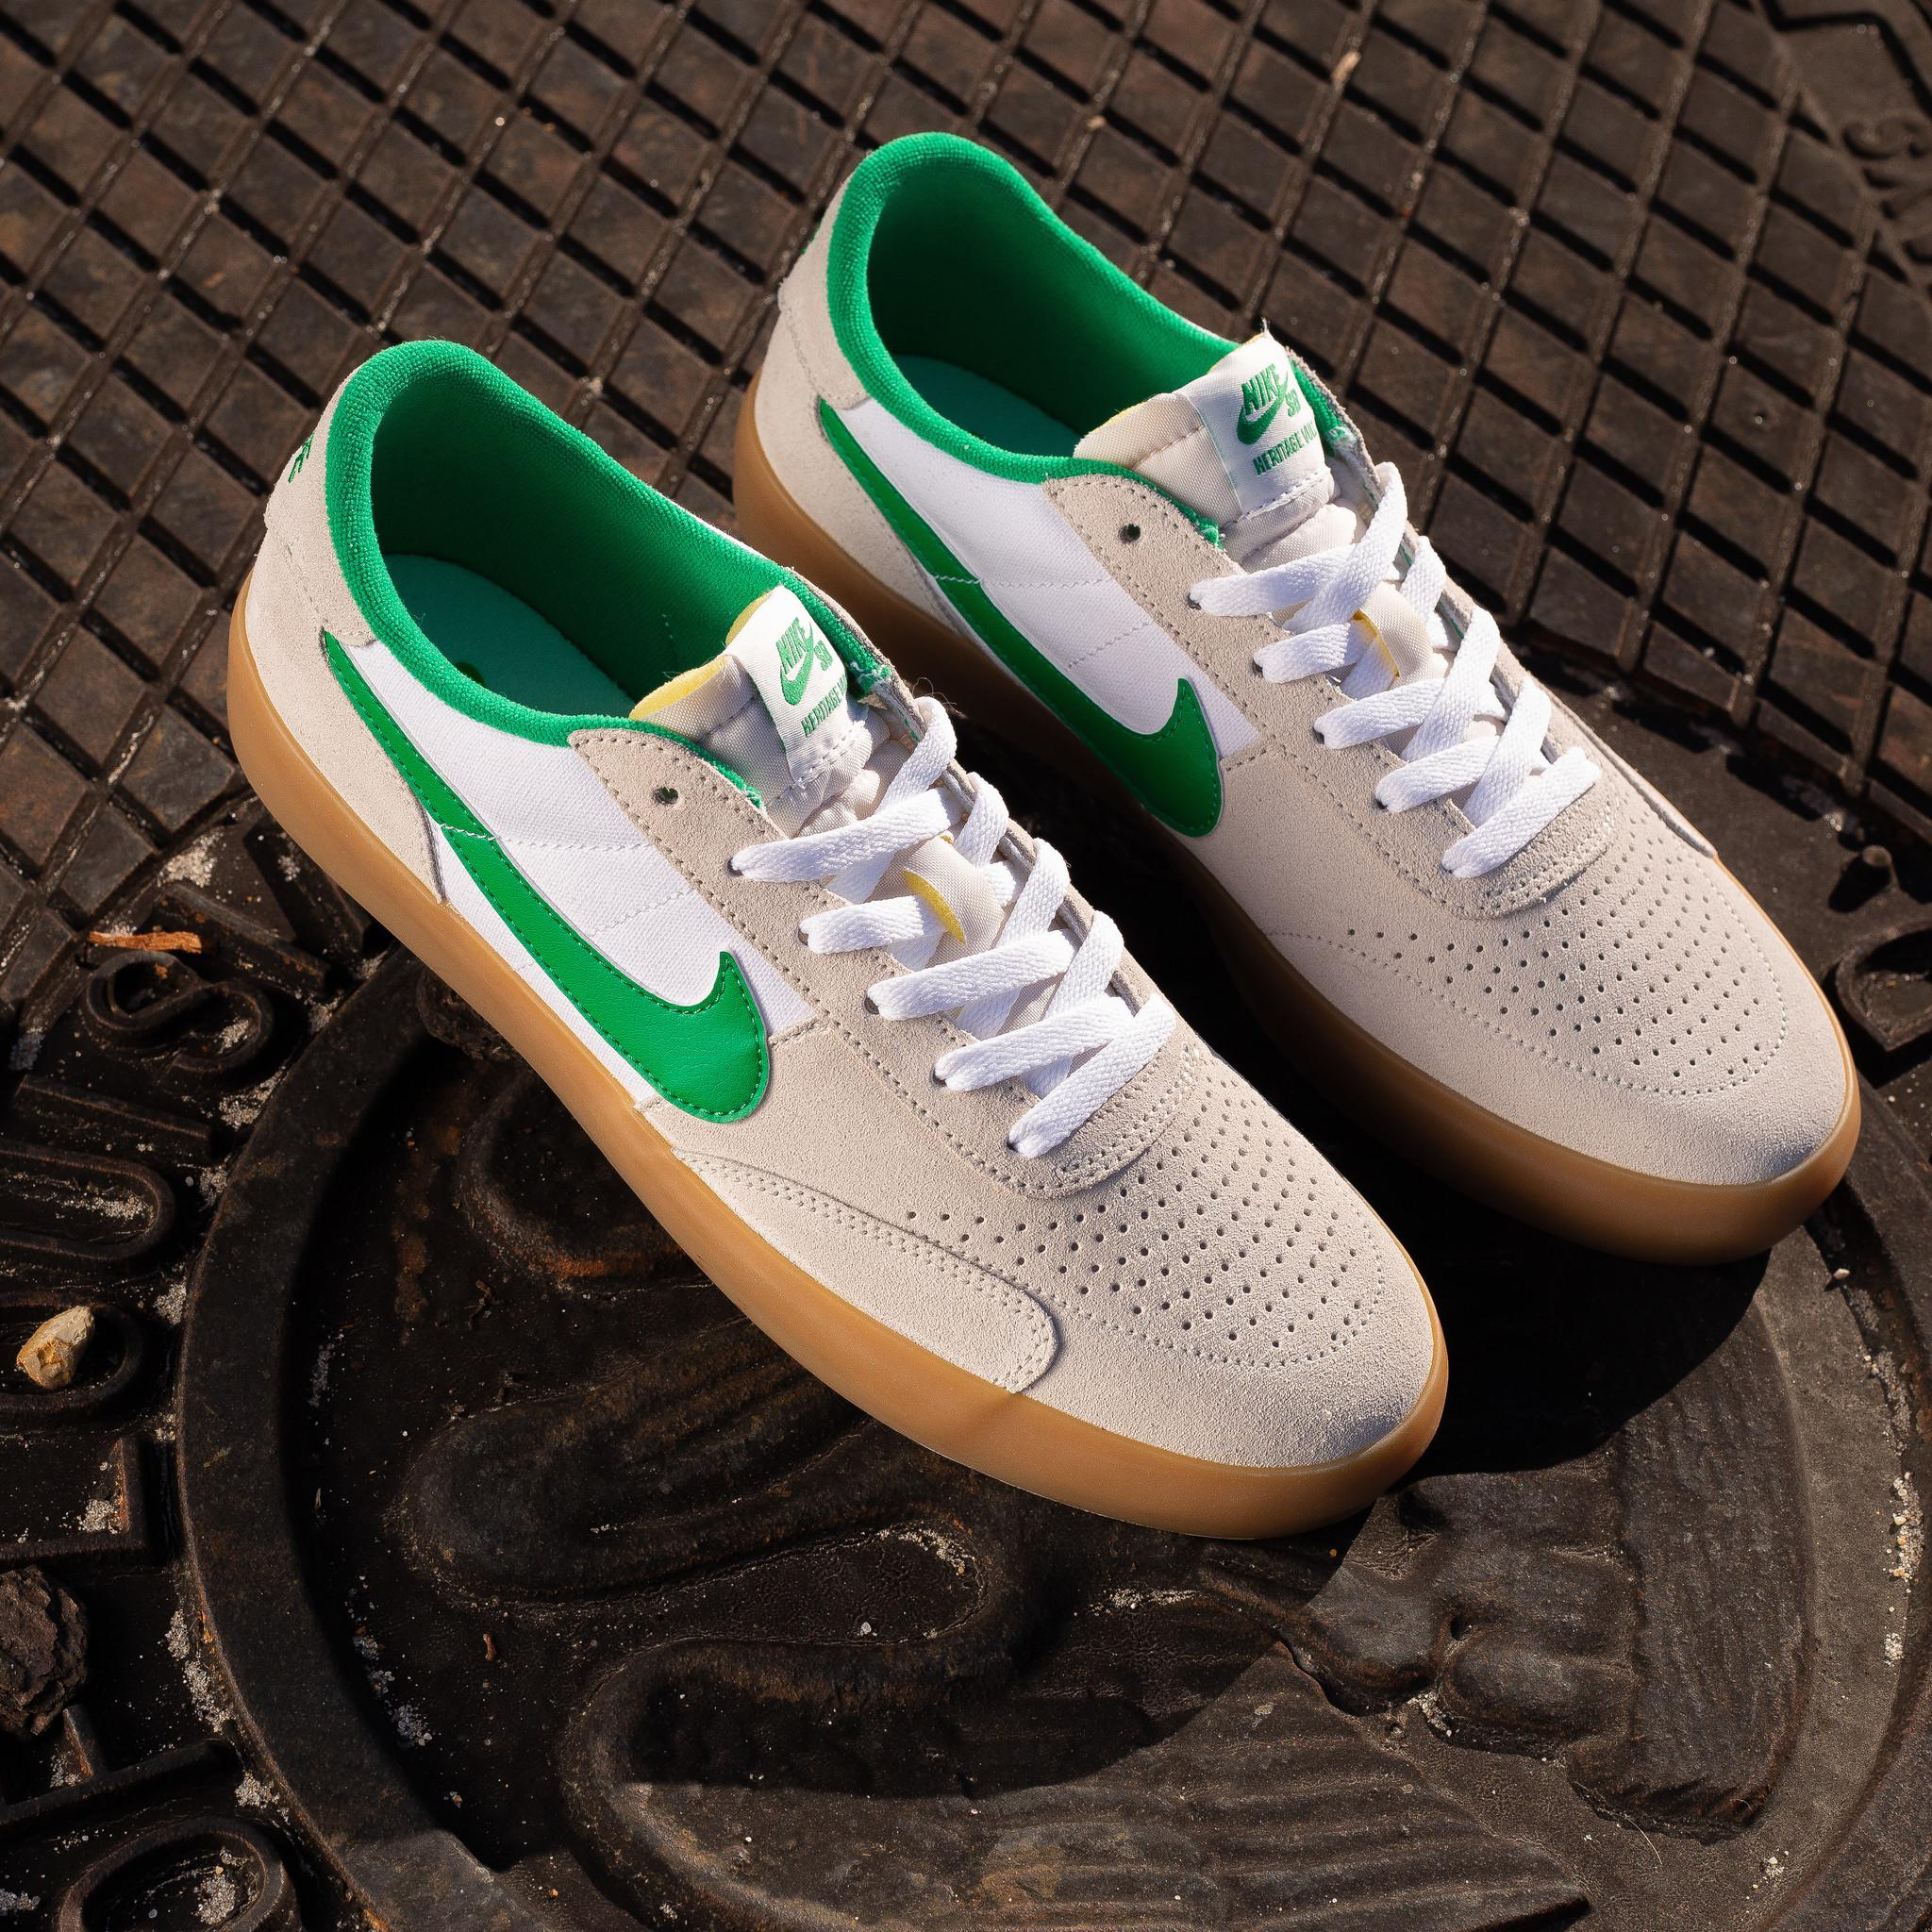 Nike SB Heritage Vulc summit white/lucky green